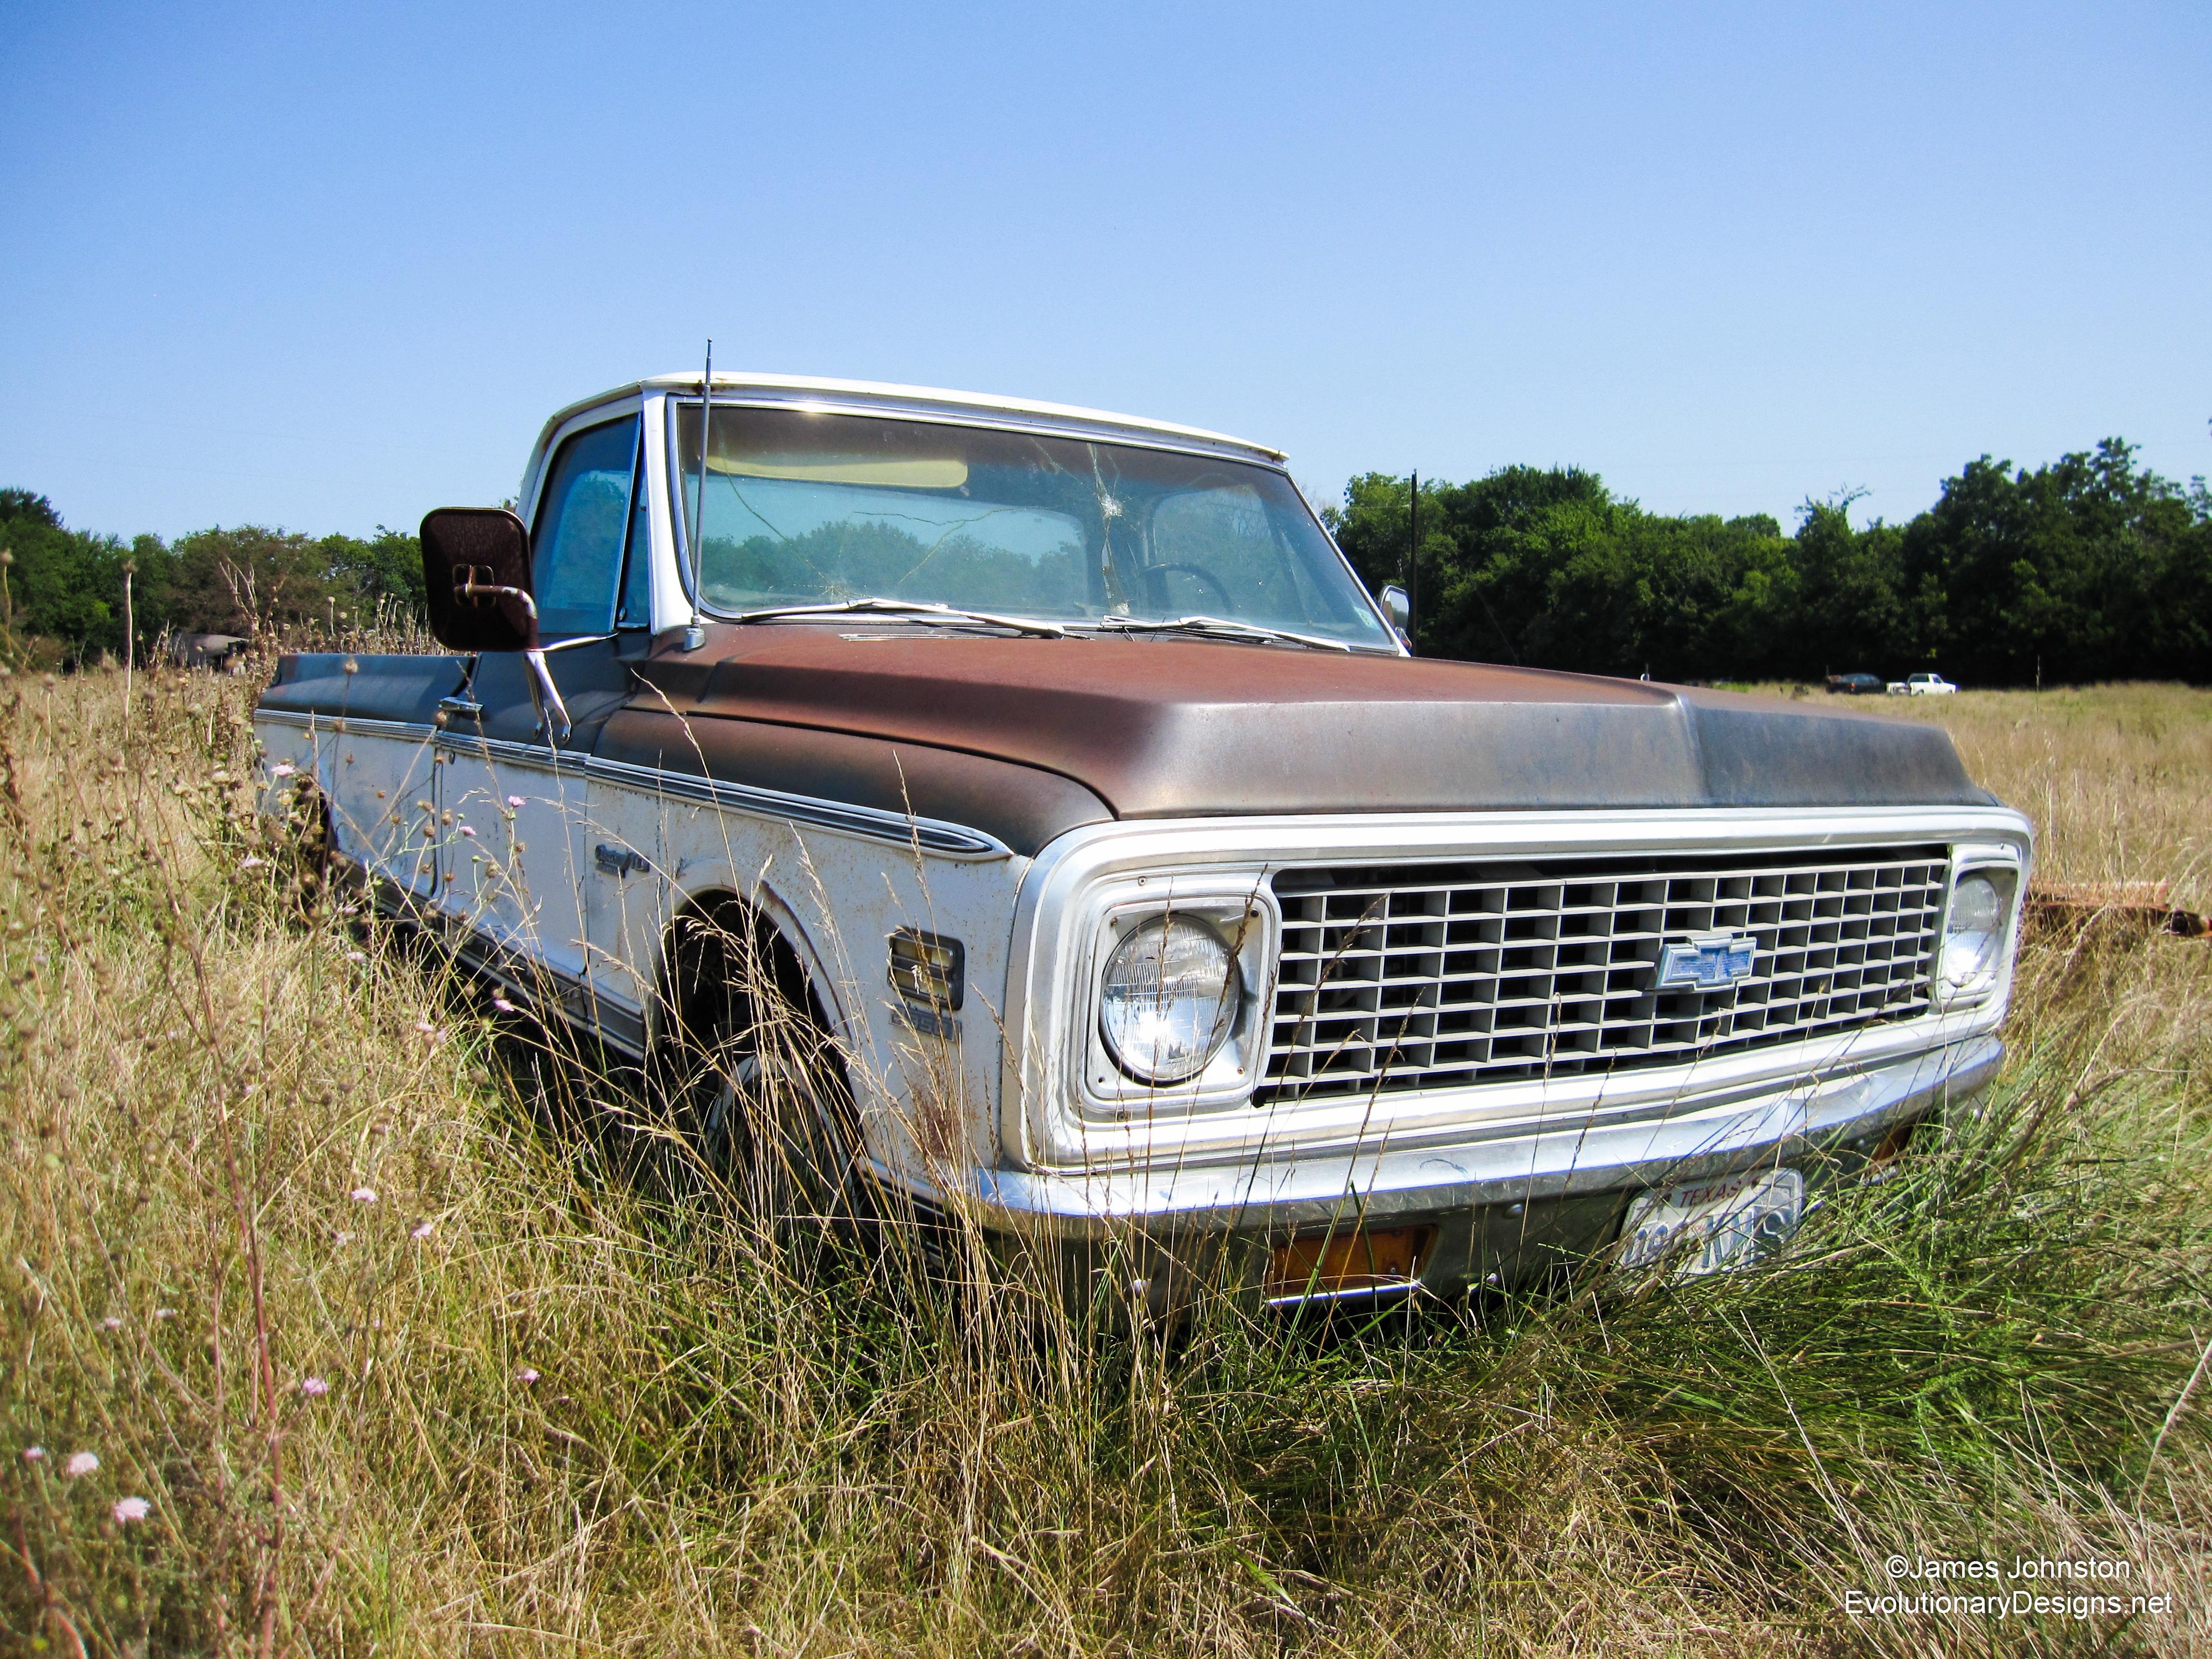 Abandoned Cars and Trucks Along HWY 121 Between Anna, Texas and Bonham, Texas